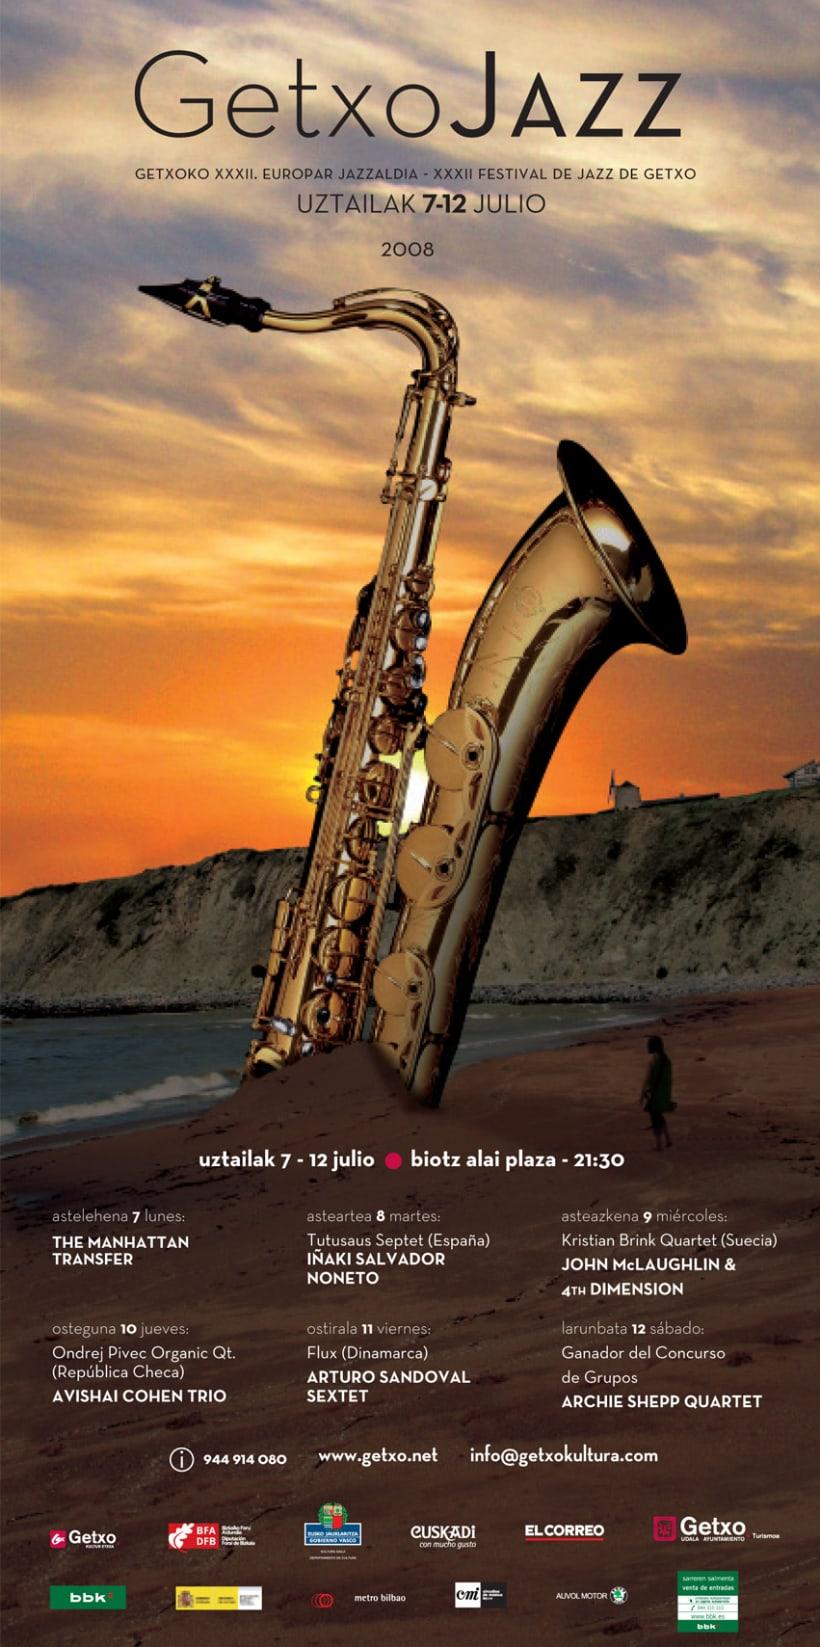 Festival de Jazz Getxo 08 1